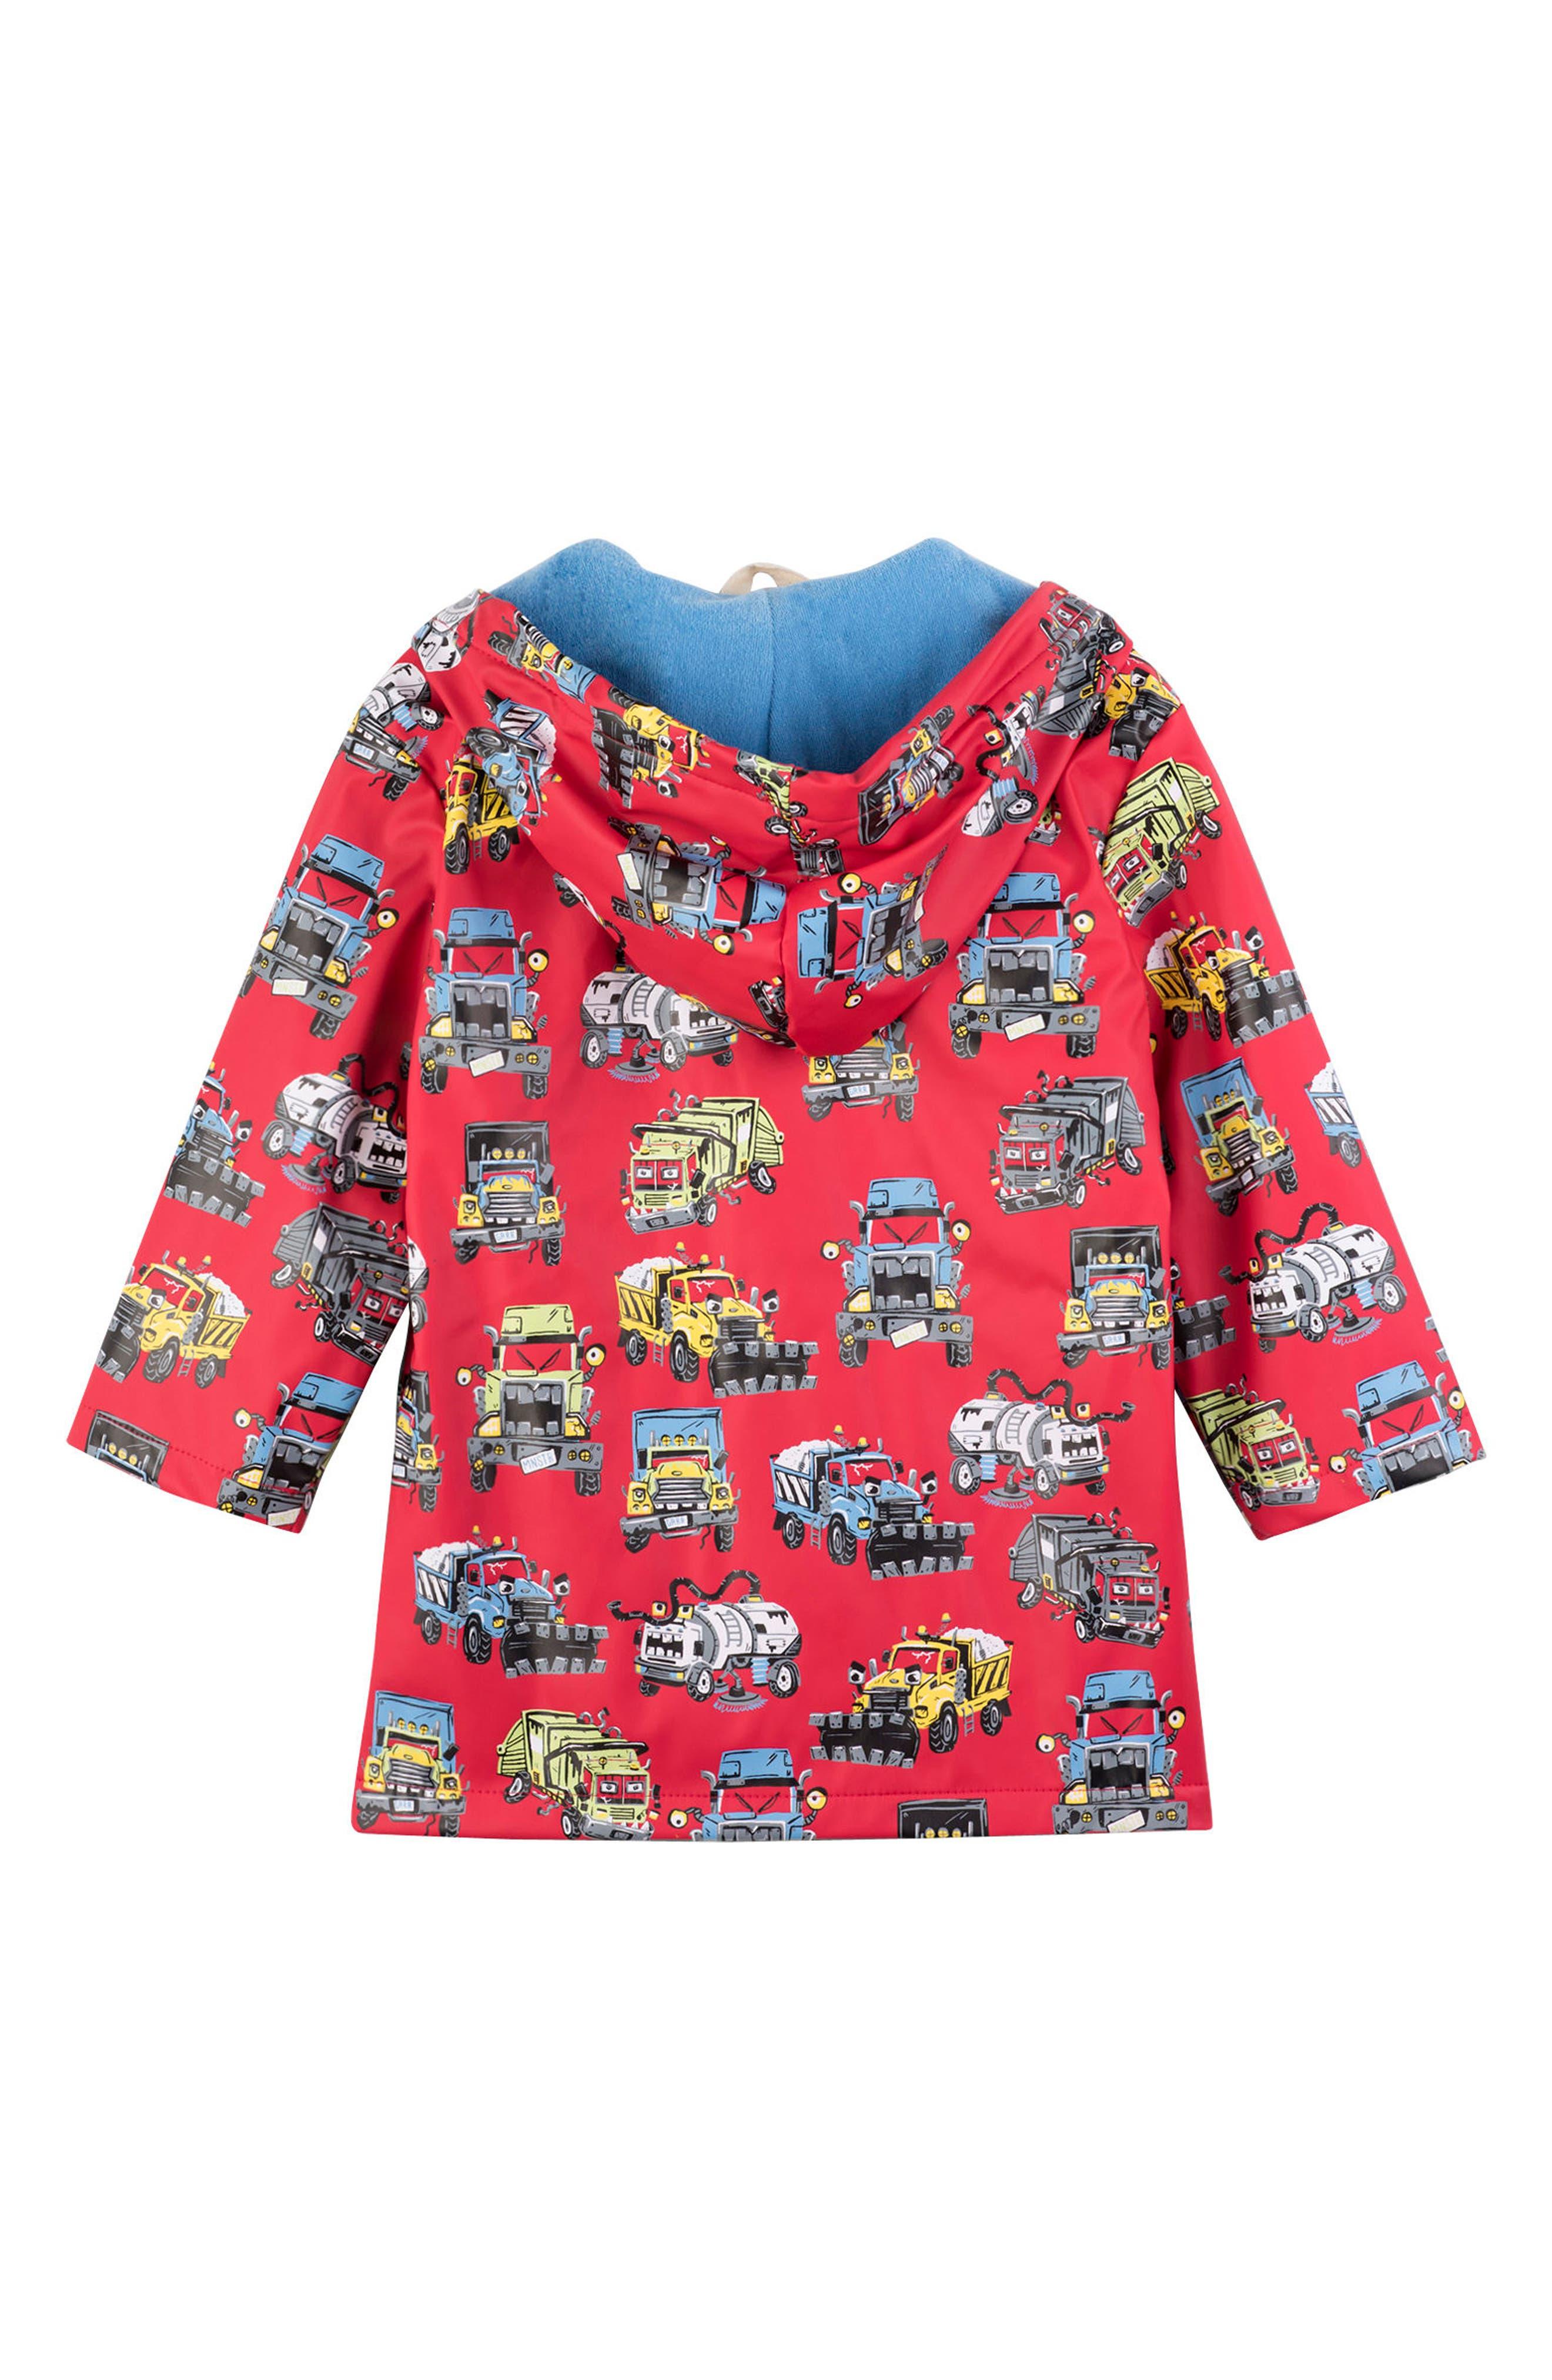 HATLEY, Monster Trucks Hooded Waterproof Raincoat, Alternate thumbnail 2, color, 600